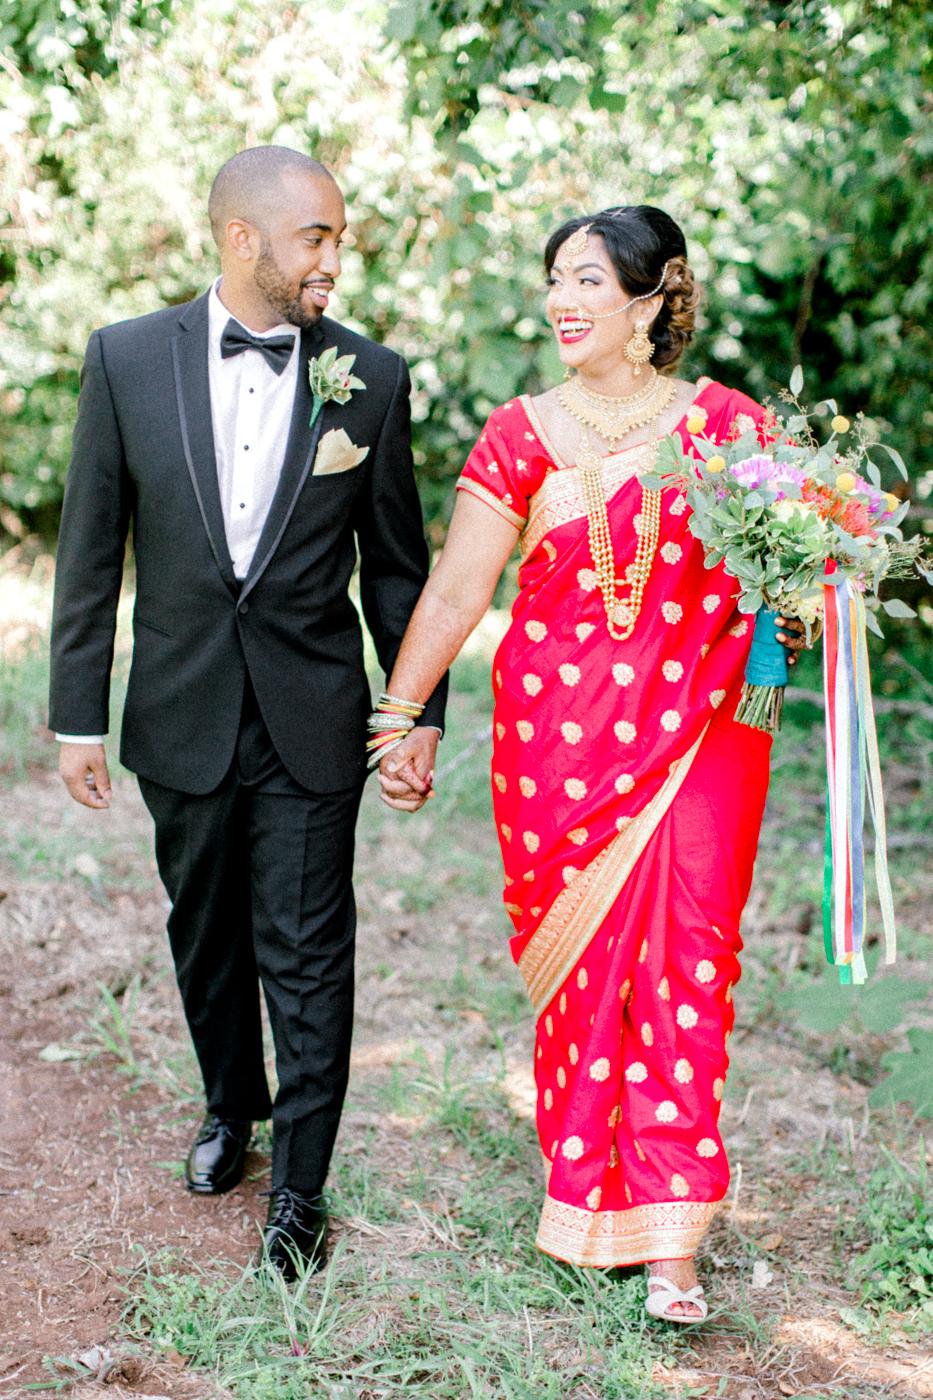 four corners photography atlanta wedding photographer indian wedding 550 trackside wedding atlanta indian wedding photographer (48 of 54).jpg